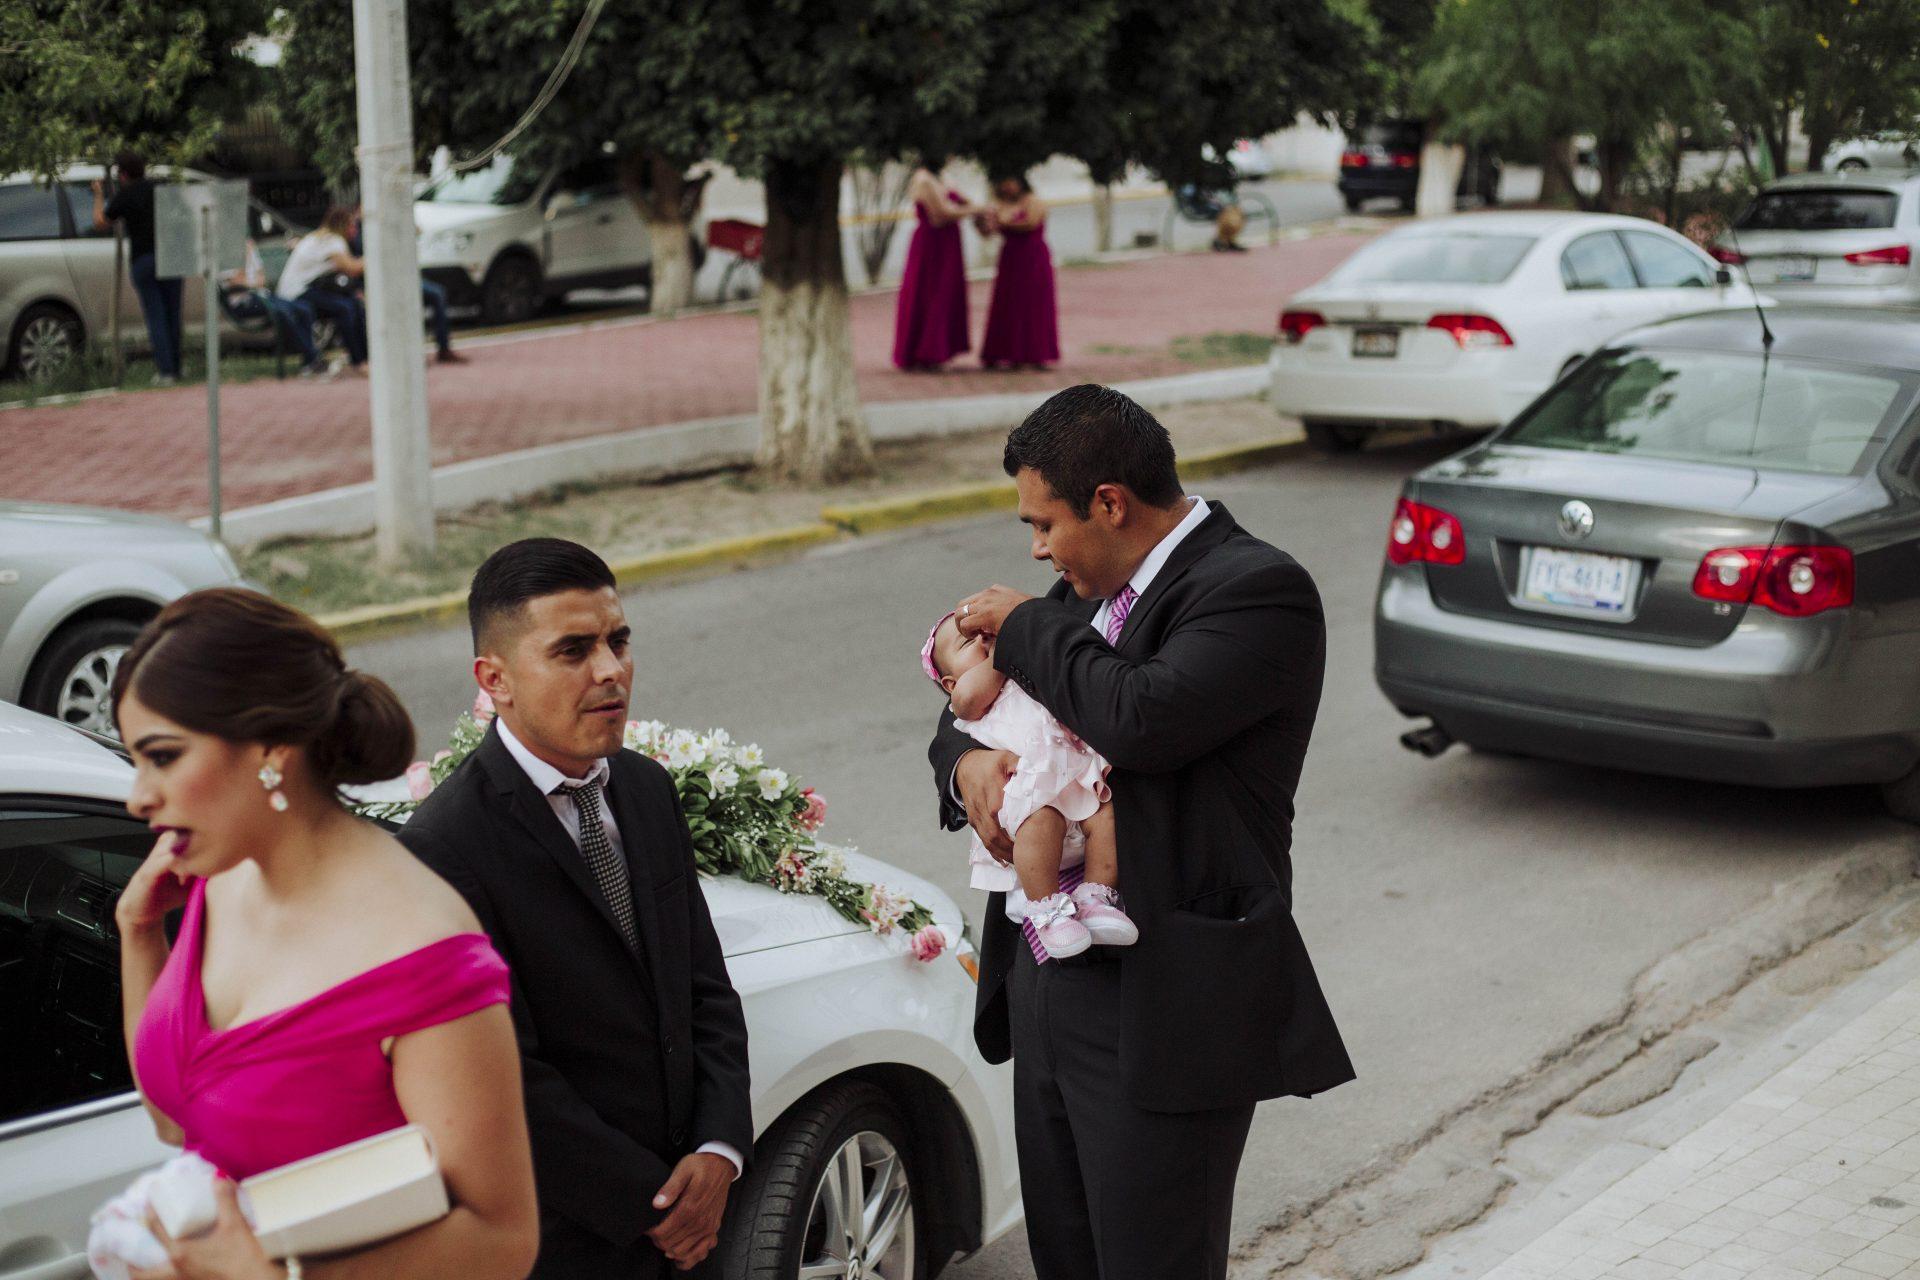 fotografo_profesional_zacatecas_chihuahua_bodas_xv_mexico-39